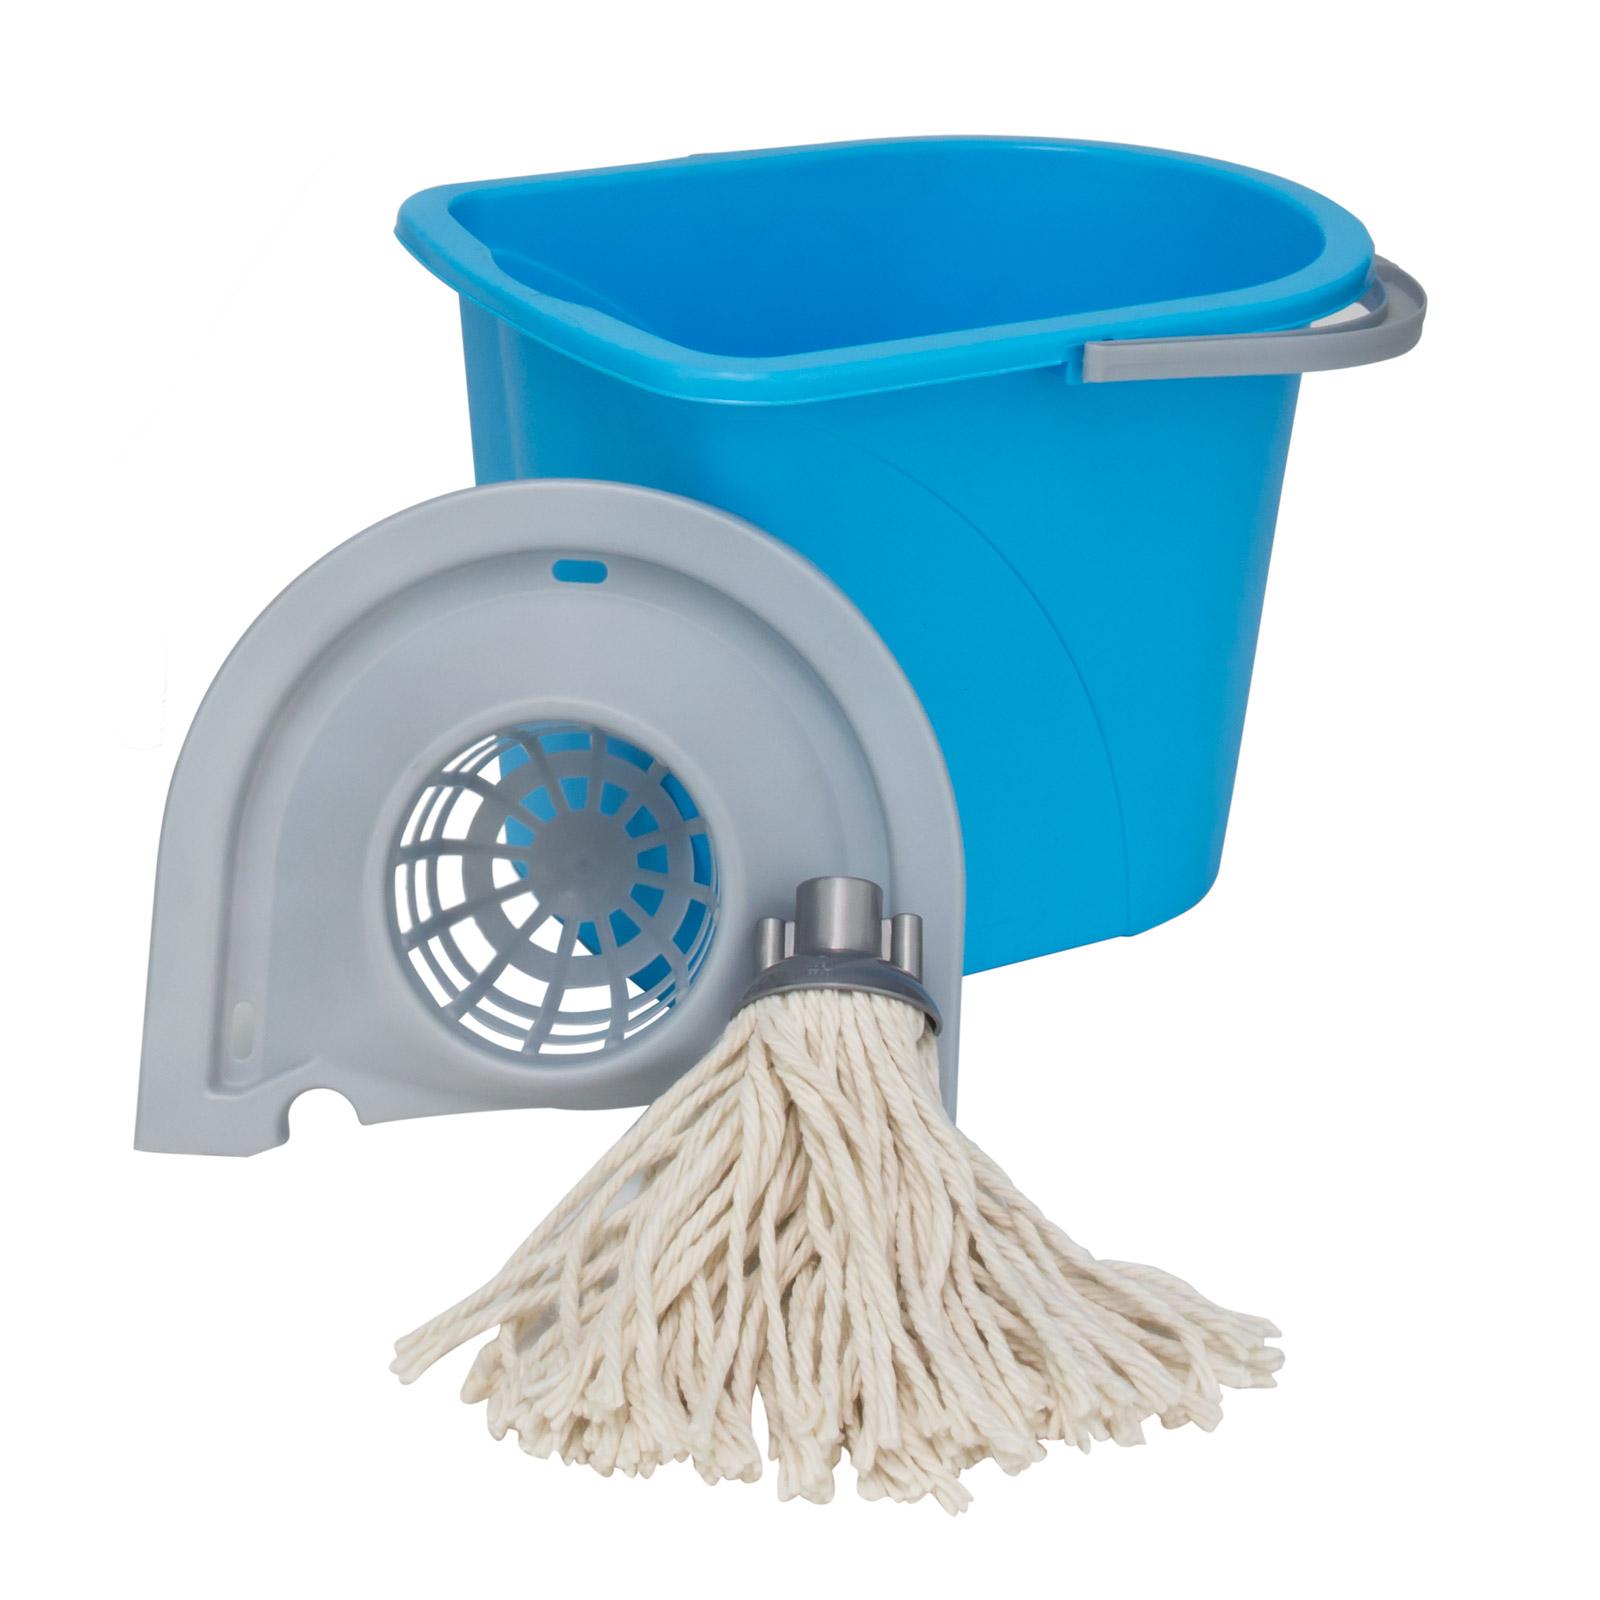 wischmop set 15 l eimer auswringsystem wischer mop putzeimer putzset ebay. Black Bedroom Furniture Sets. Home Design Ideas